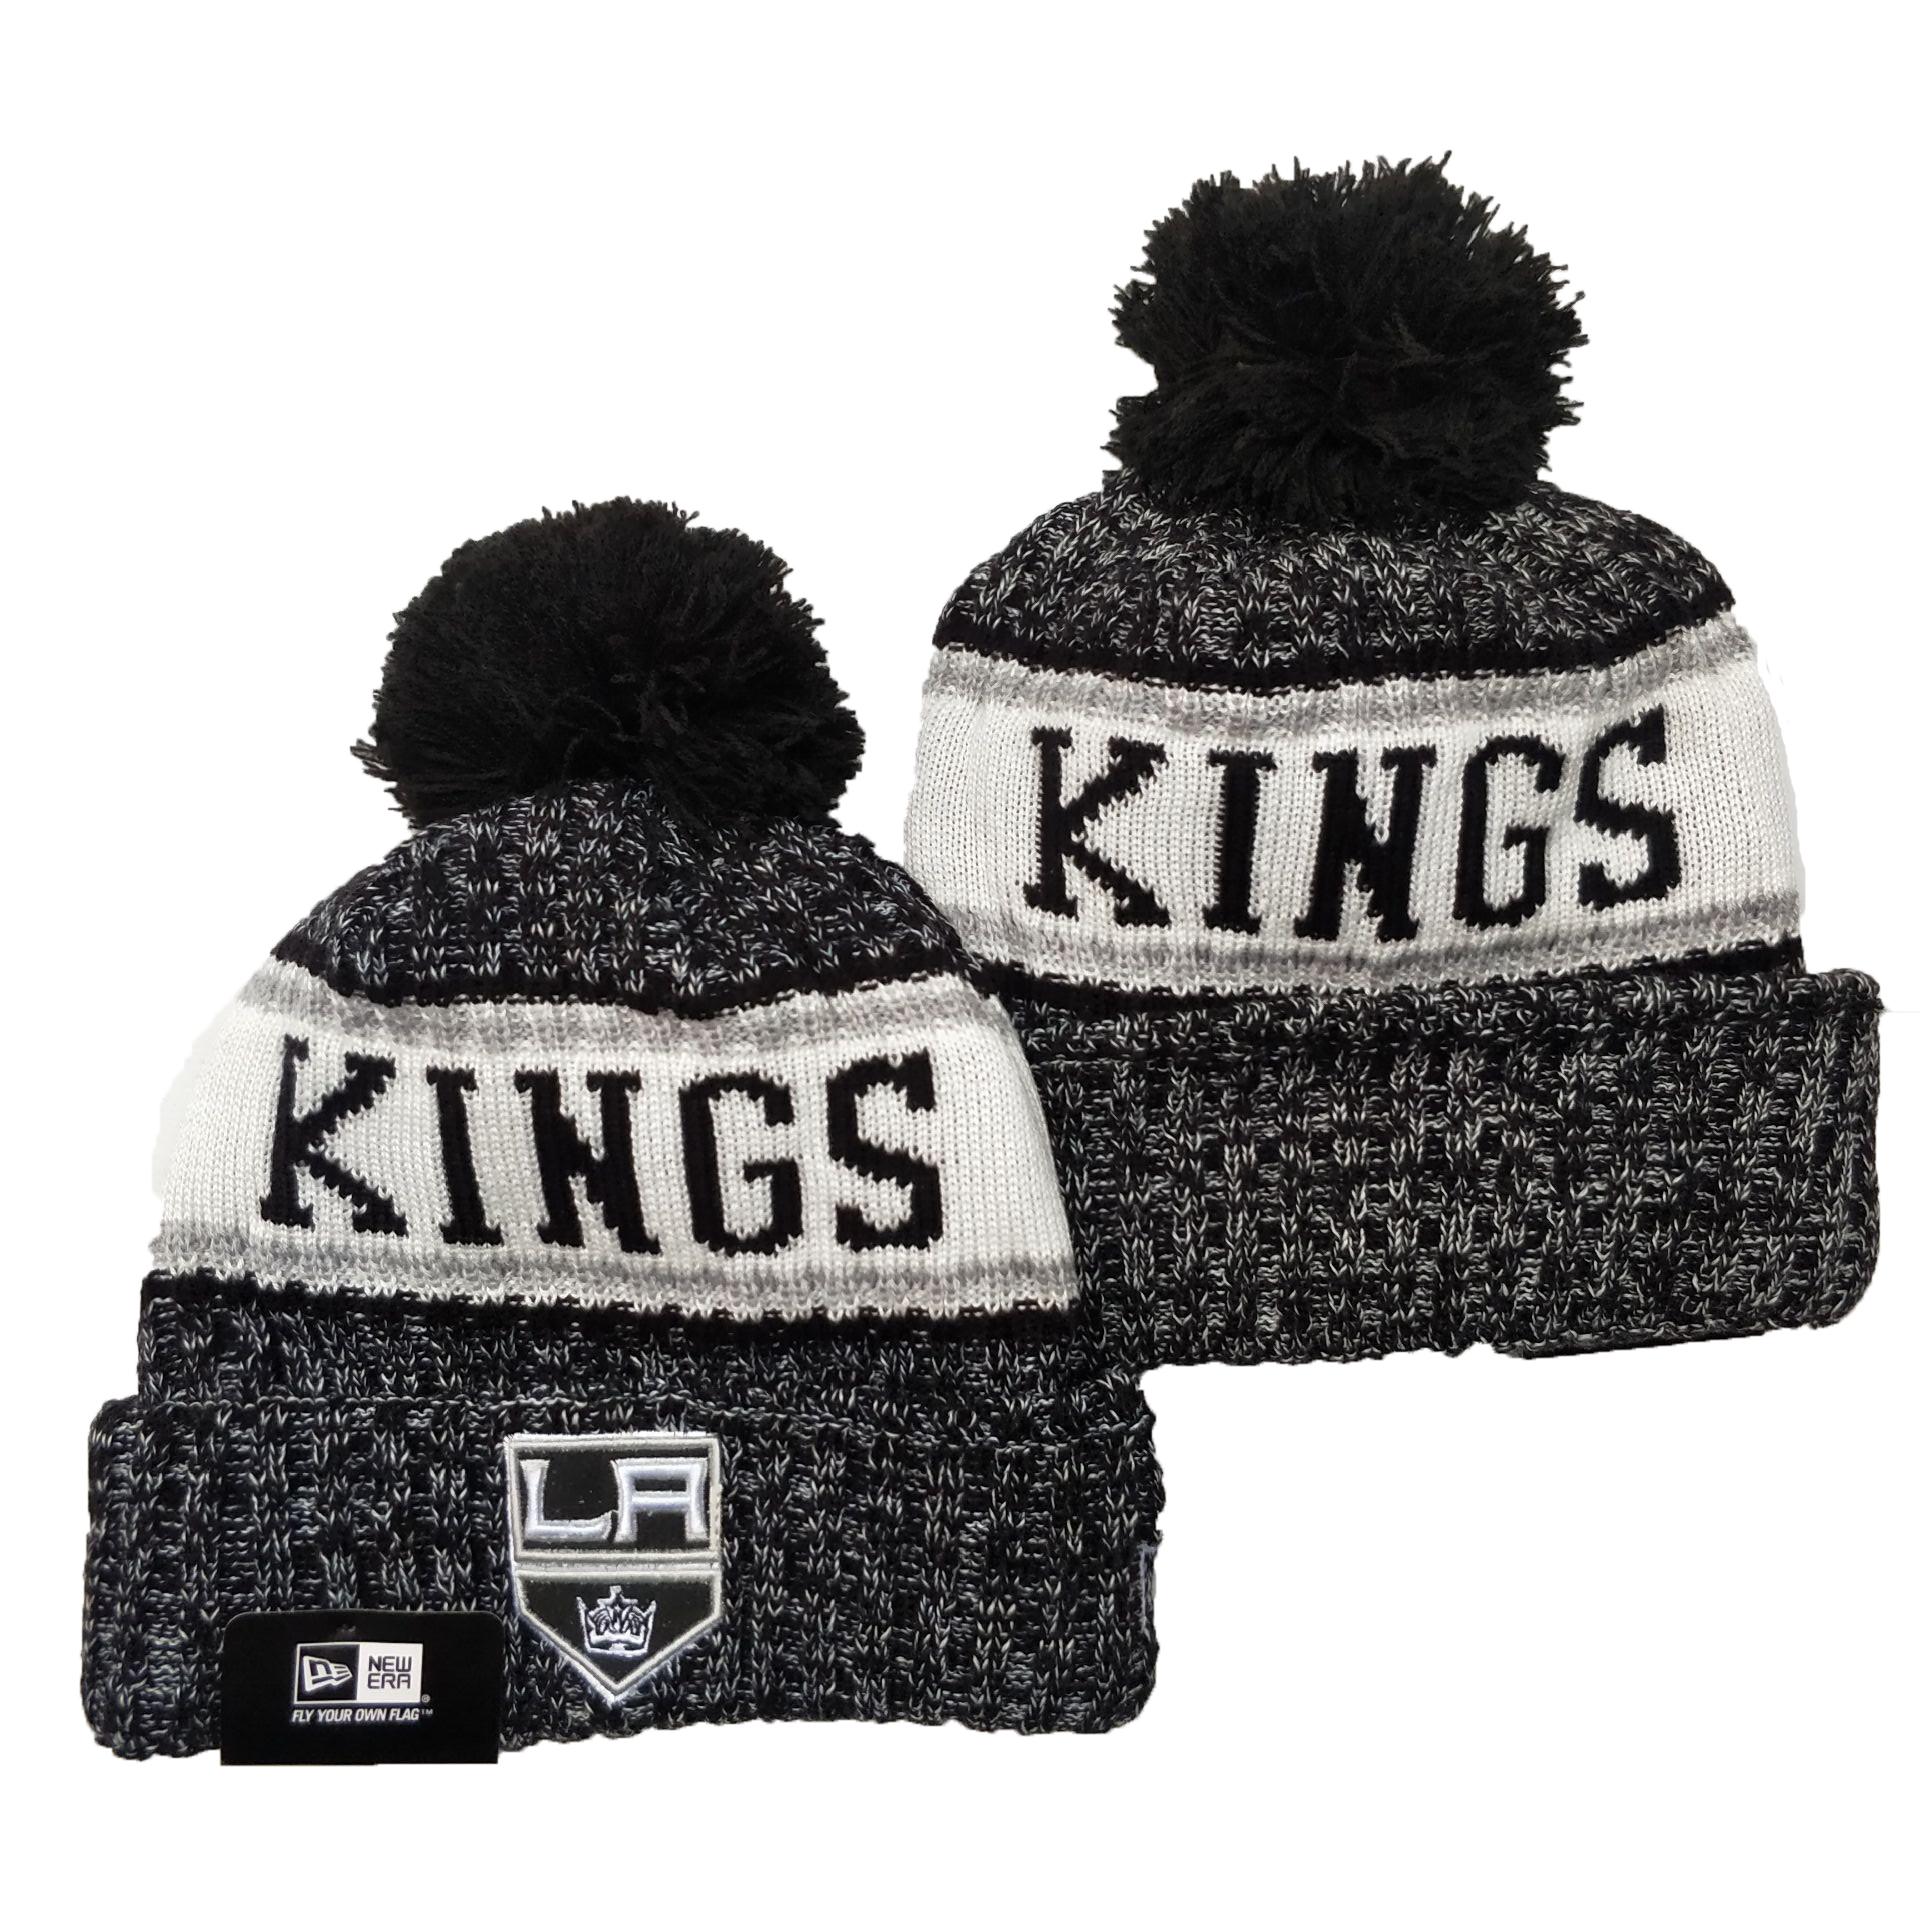 Los Angeles Kings Team Logo Gray Black Pom Cuffed Knit Hat YD